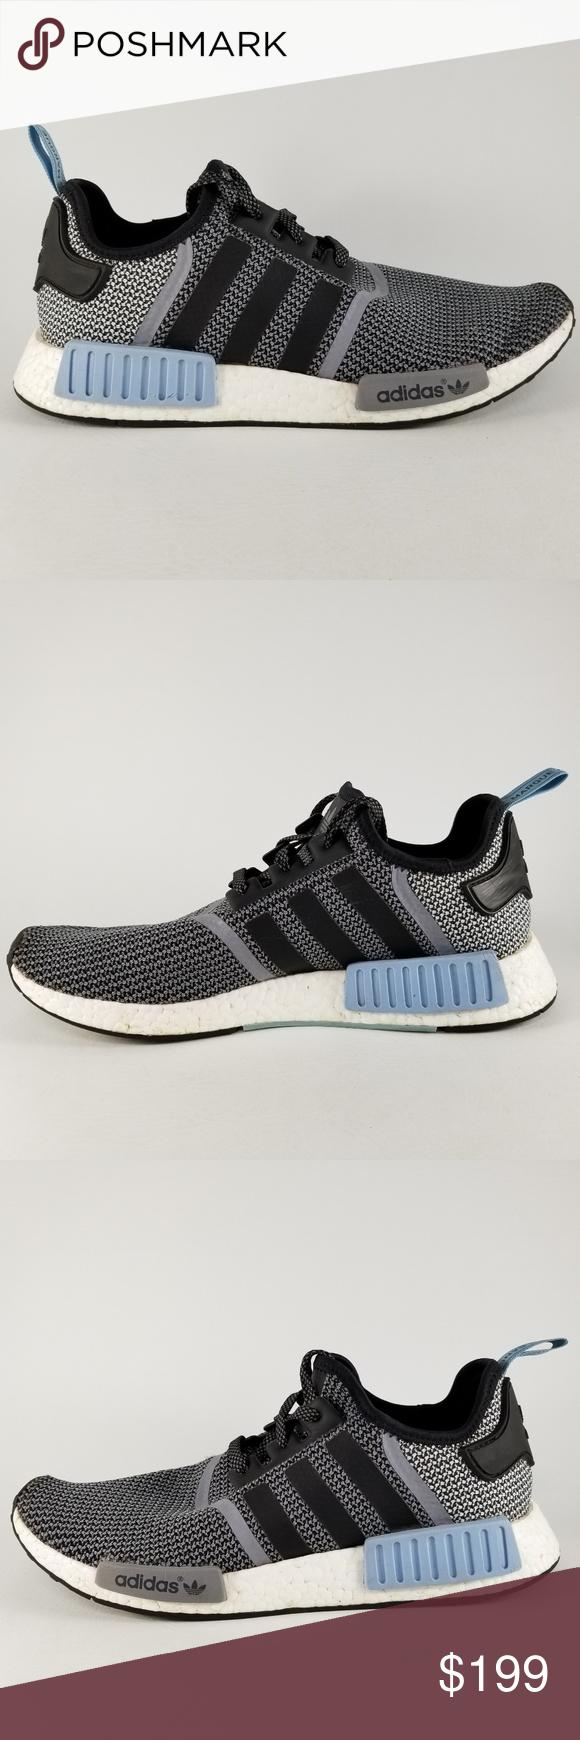 Men's Shoes 12 Nmd R1 Size Running Adidas Boost vNOywnm08